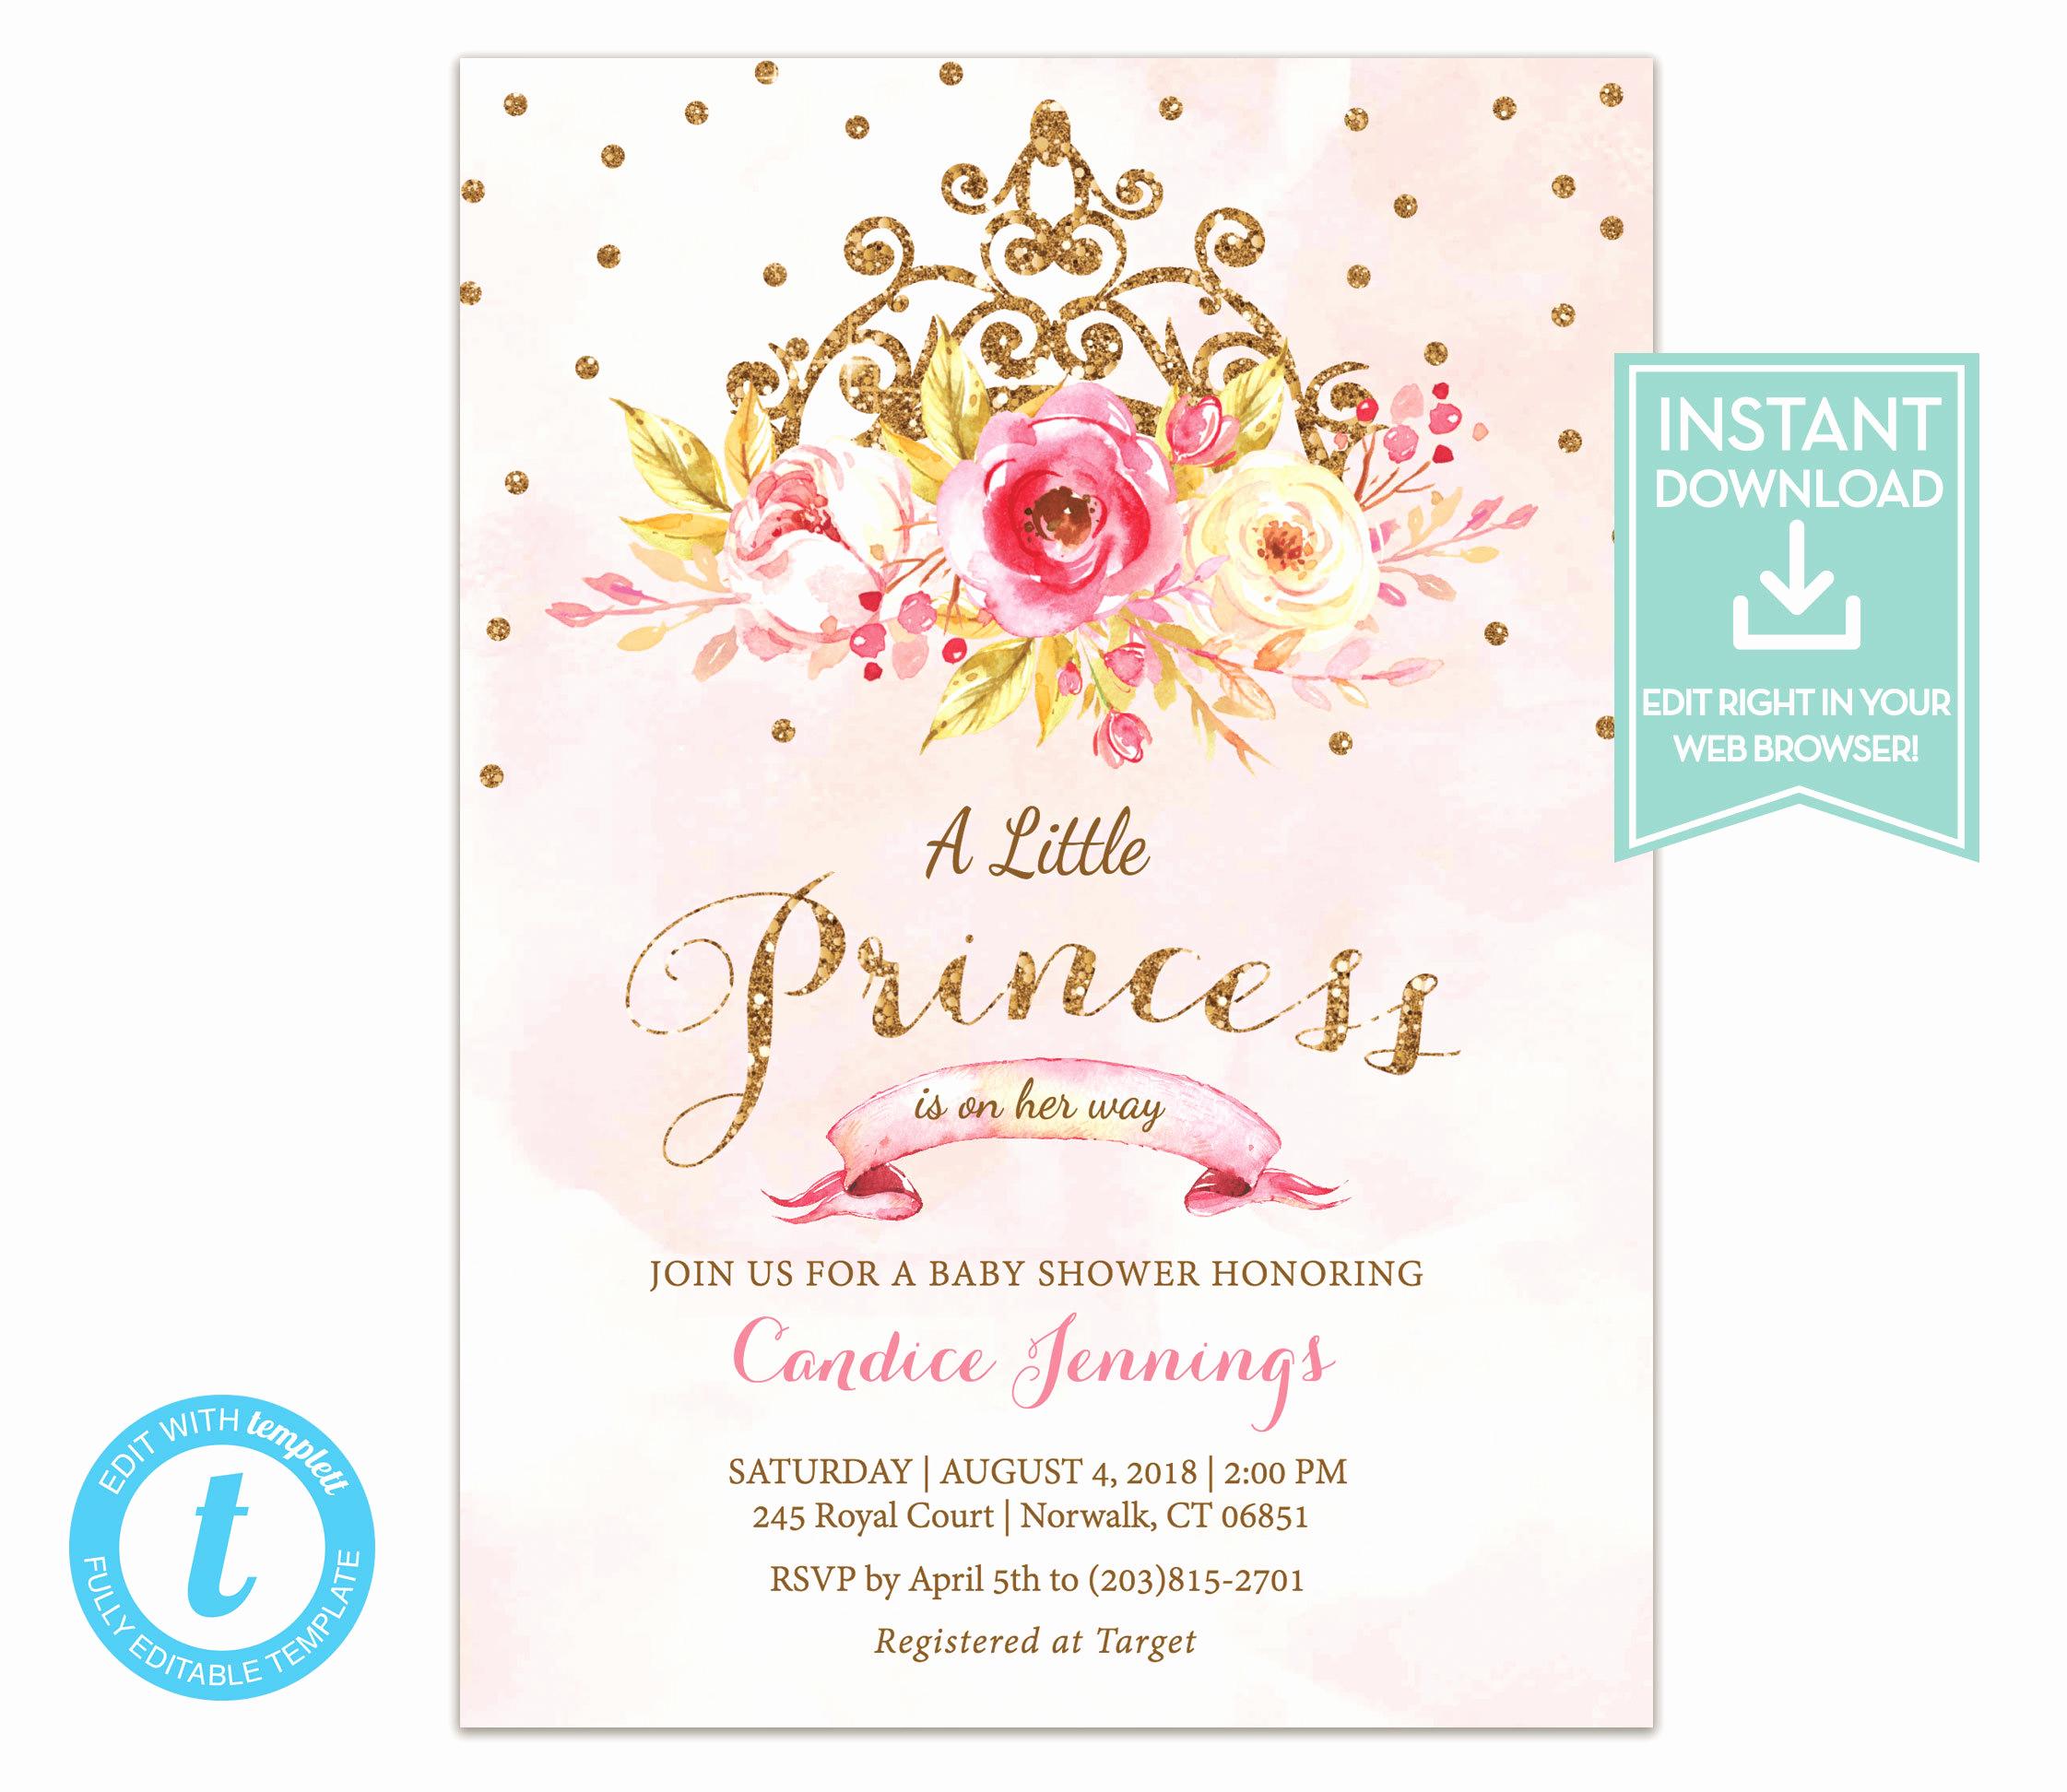 Princess Baby Shower Invitation Wording Fresh Little Princess Baby Shower Invitation Instant Download